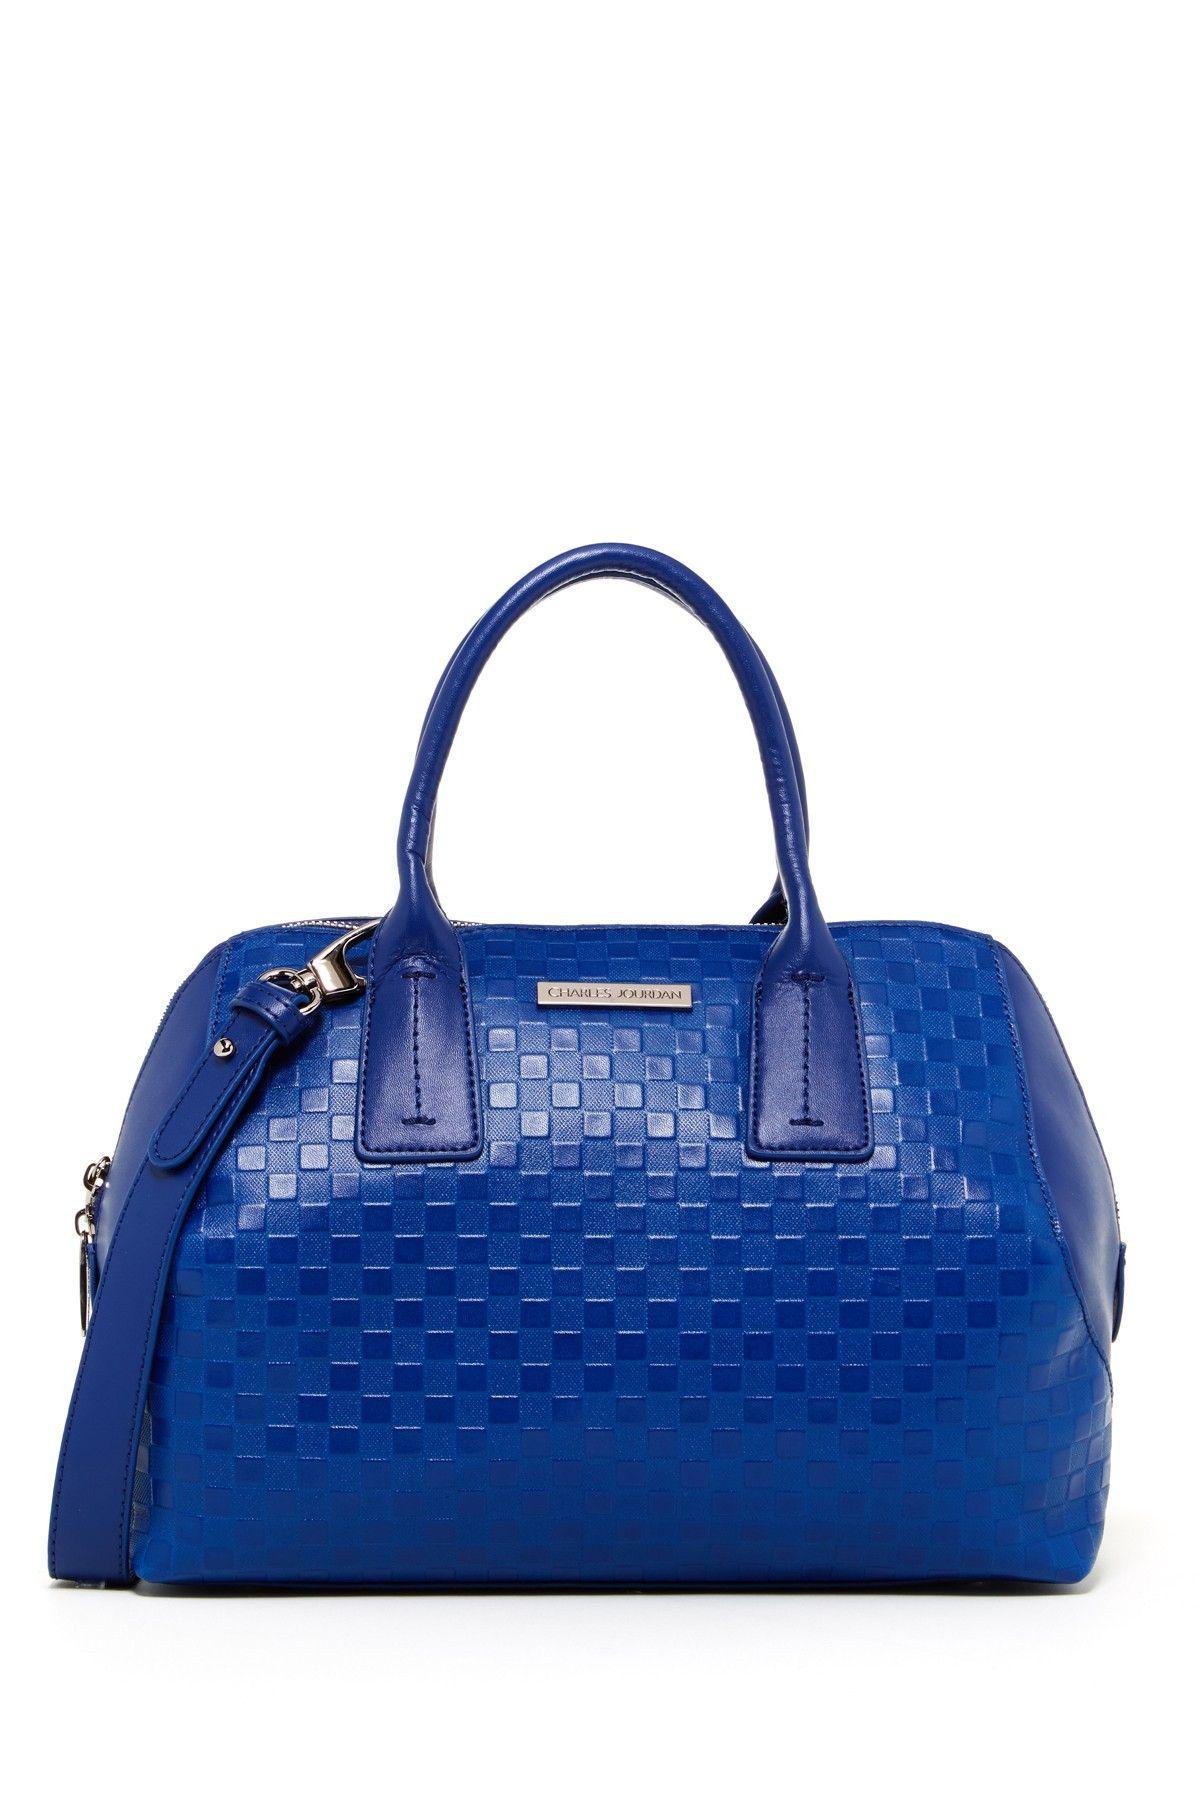 8c111fdd1144 Charles Jourdan | Kamea Handbag | HANDBAGS / BAGS / TRAVEL BAGS ...